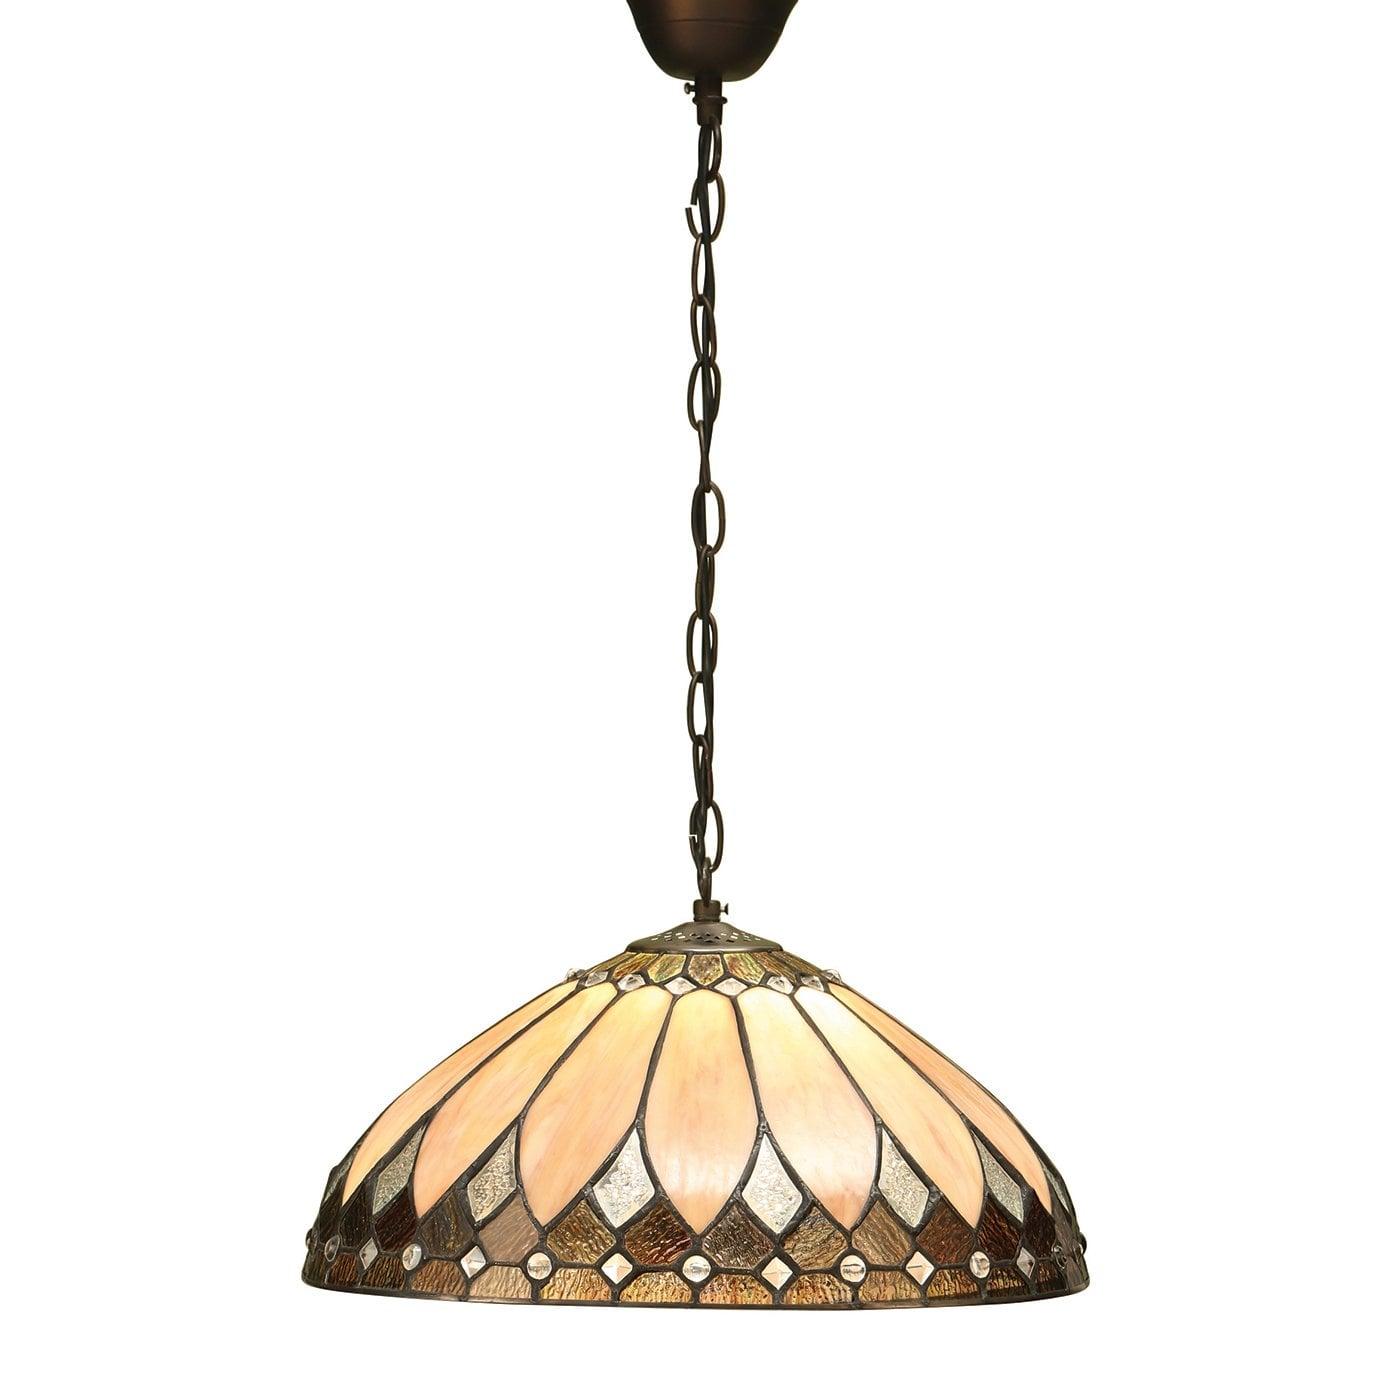 Interiors 1900 63977 Brooklyn Medium 1lt pendant, Tiffany